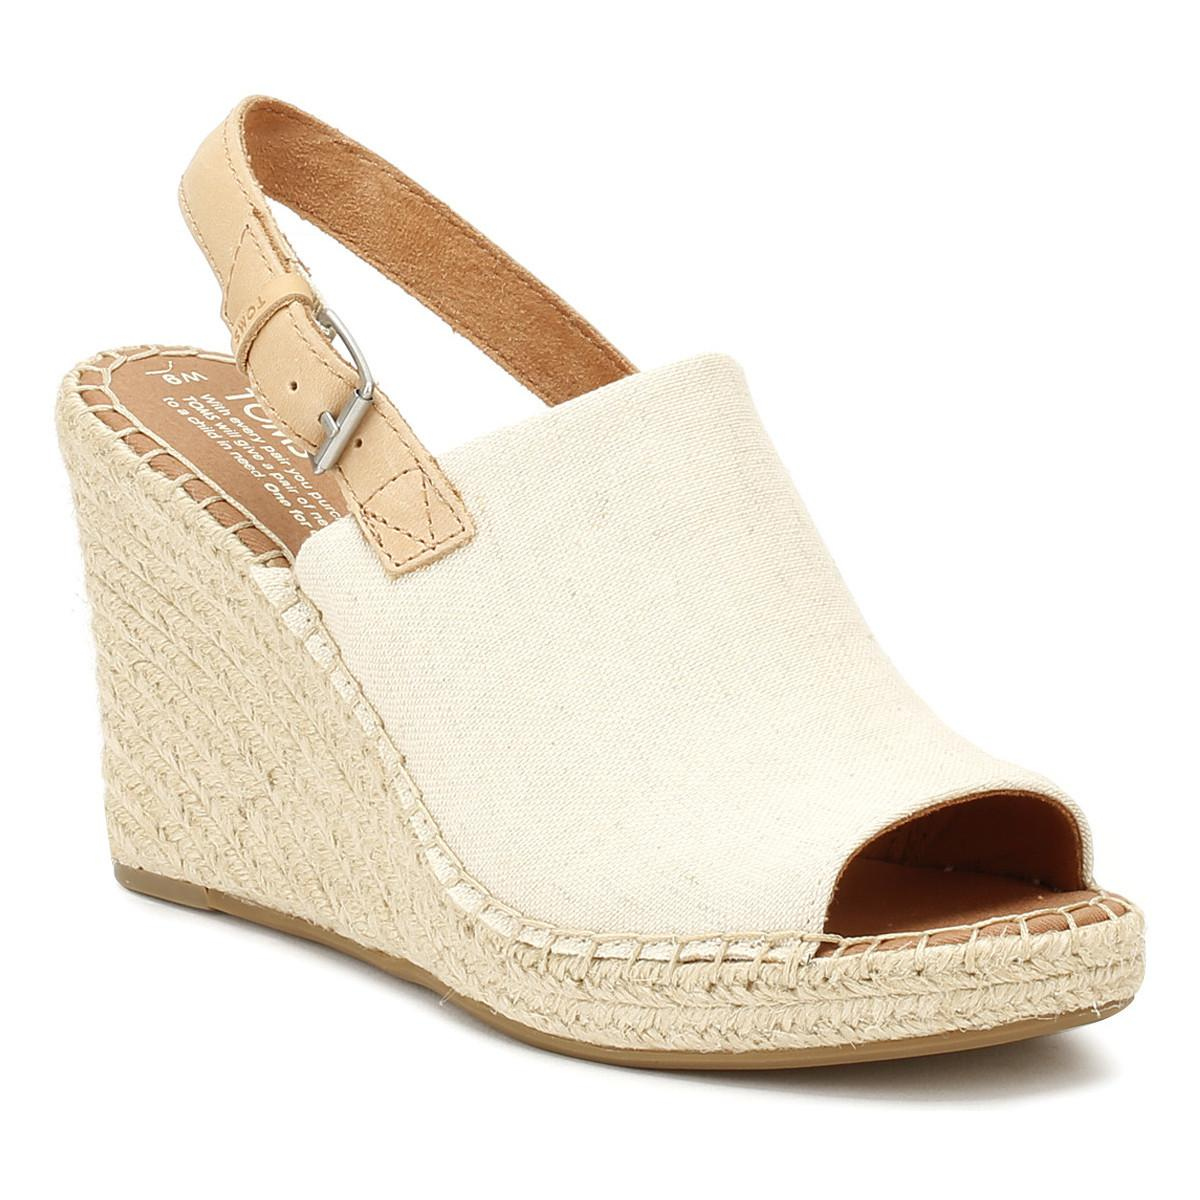 72730b9653f TOMS Womens Natural Hemp Monica Wedges Women s Sandals In Beige in ...